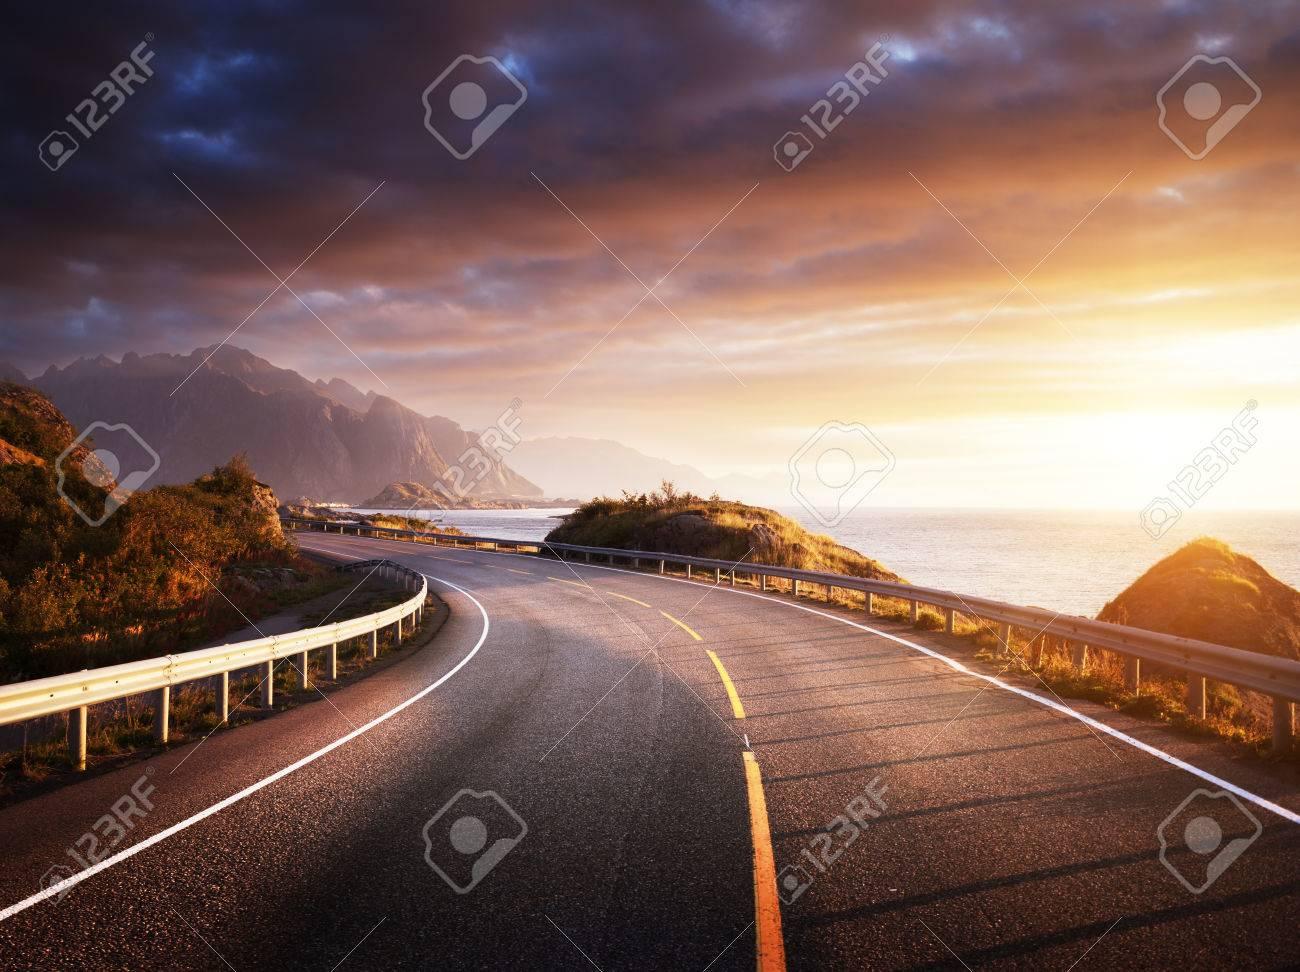 oad by the sea in sunrise time, Lofoten island, Norway - 67818798